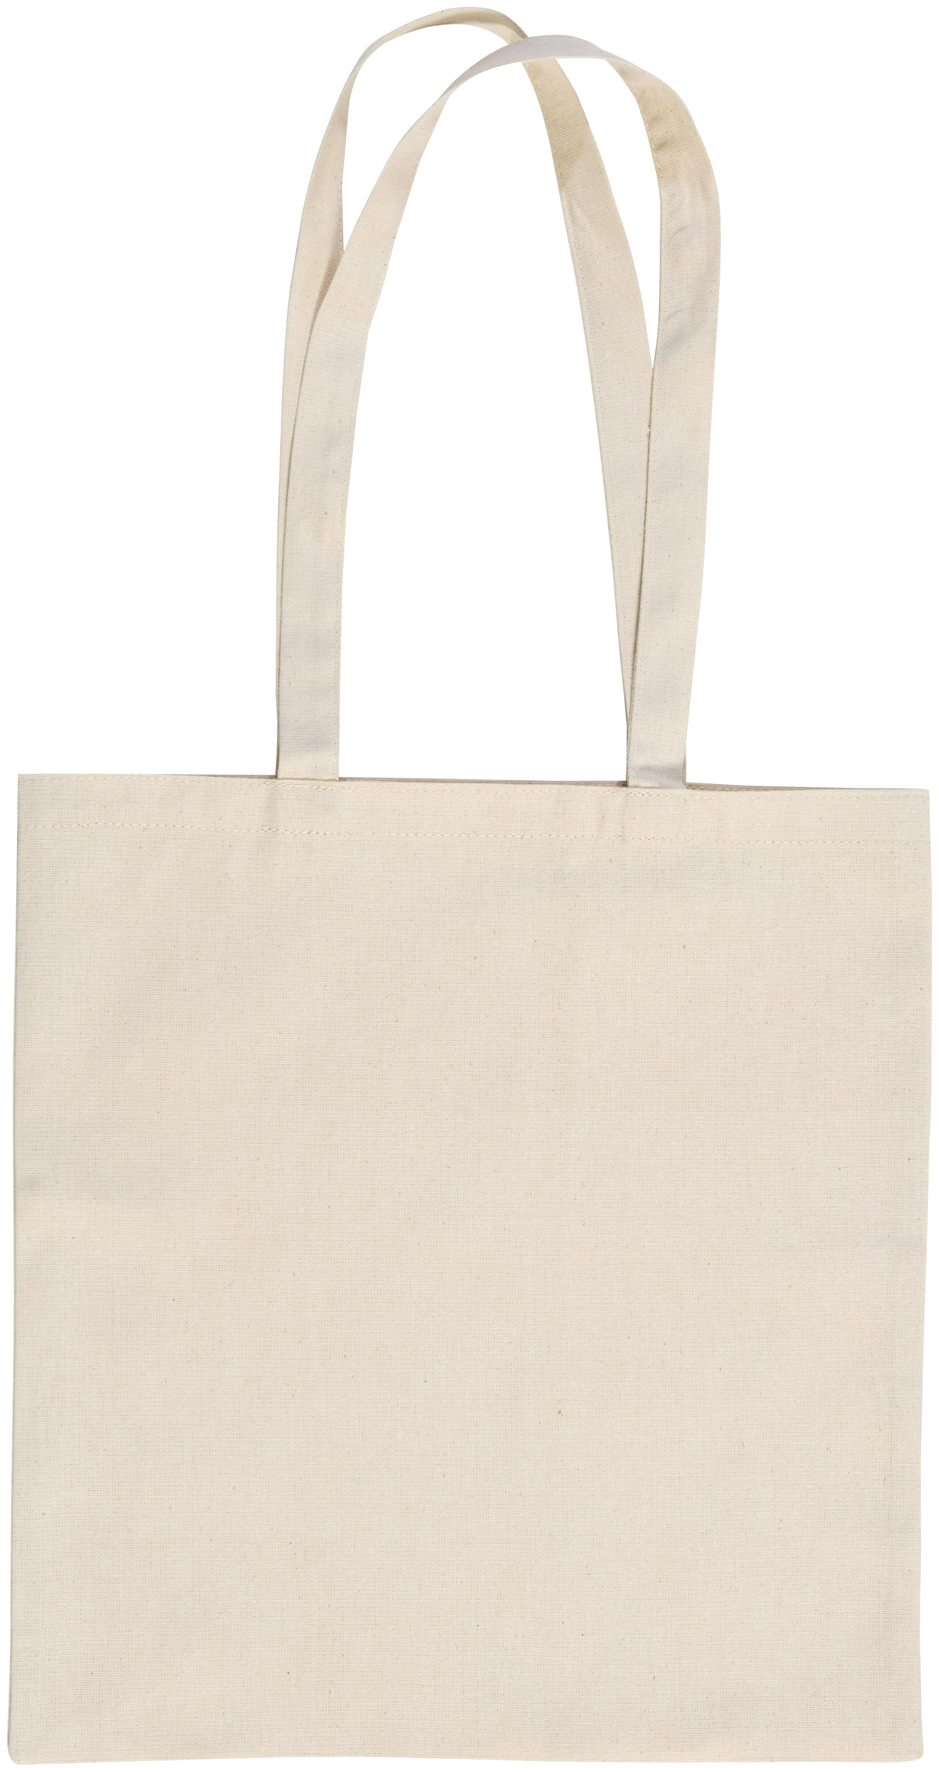 Branded Groombridge 10oz Cotton Canvas Tote Bag